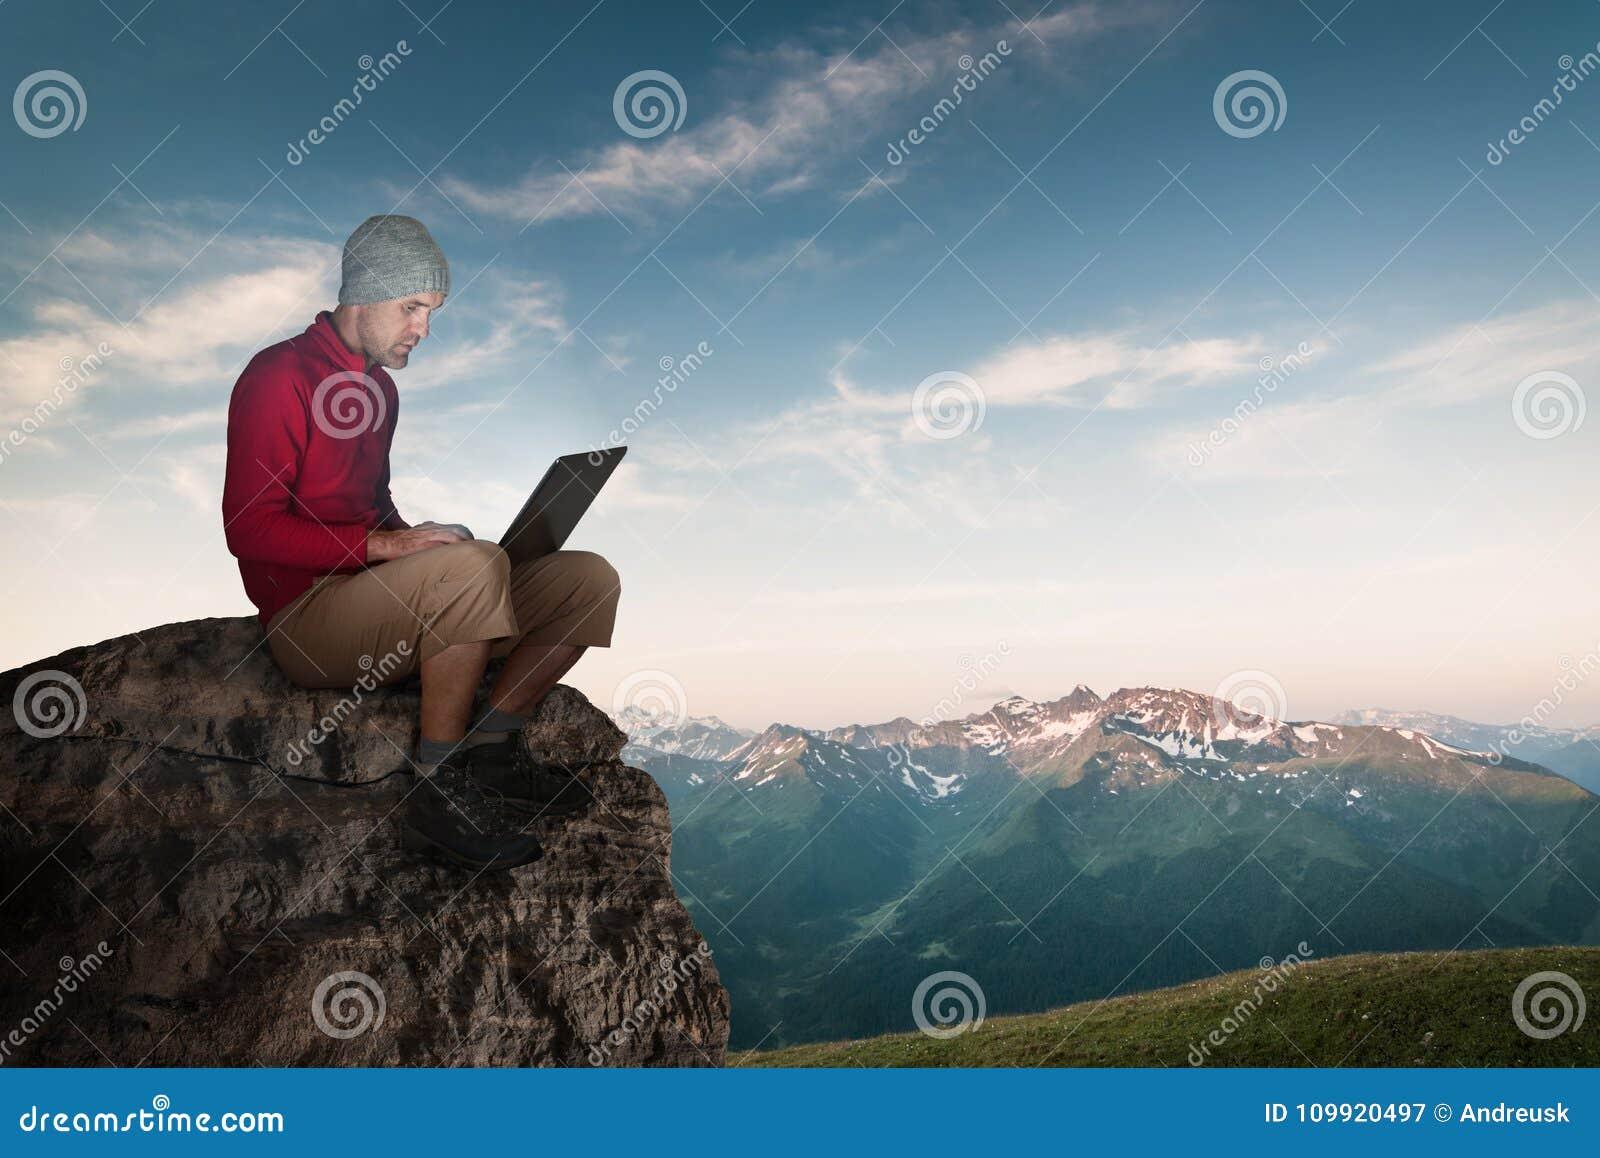 Man working wireless outdoors